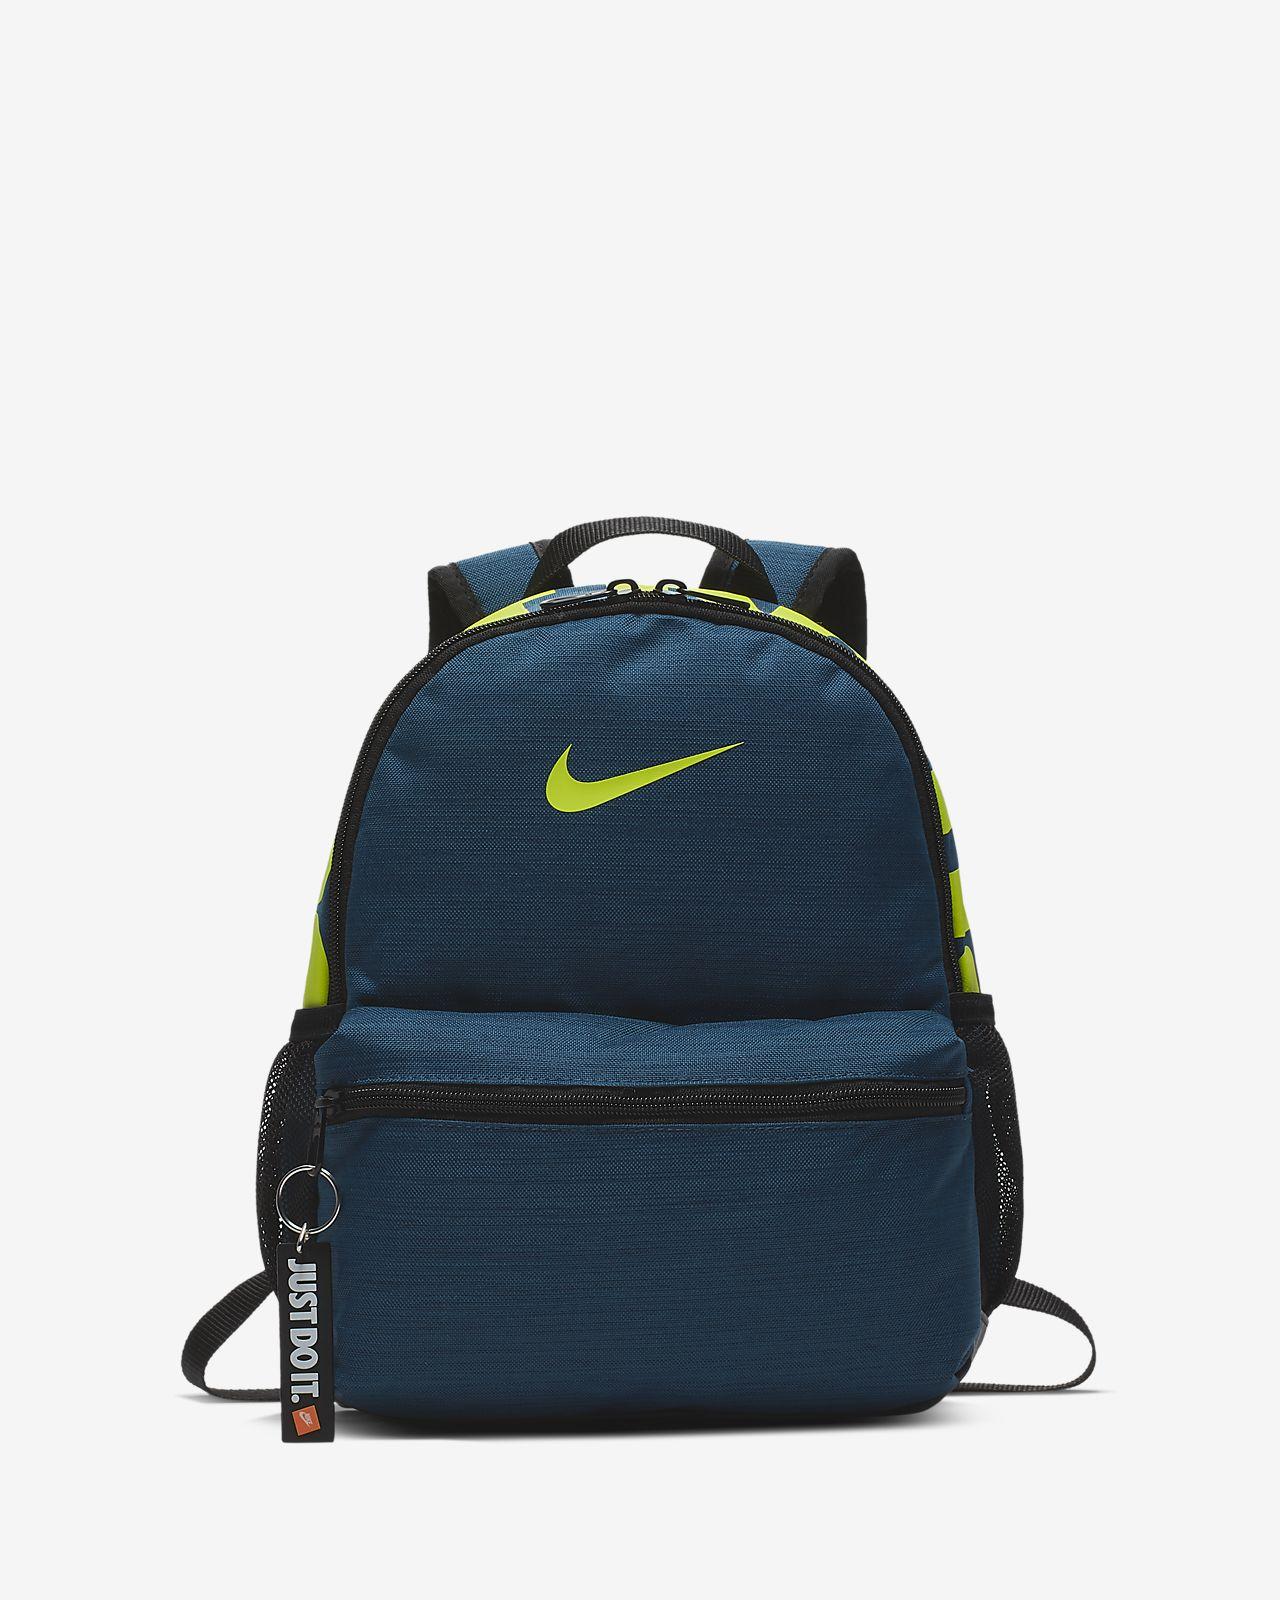 cad66c5d52 Nike Brasilia Just Do It Kids  Backpack (Mini). Nike.com AU